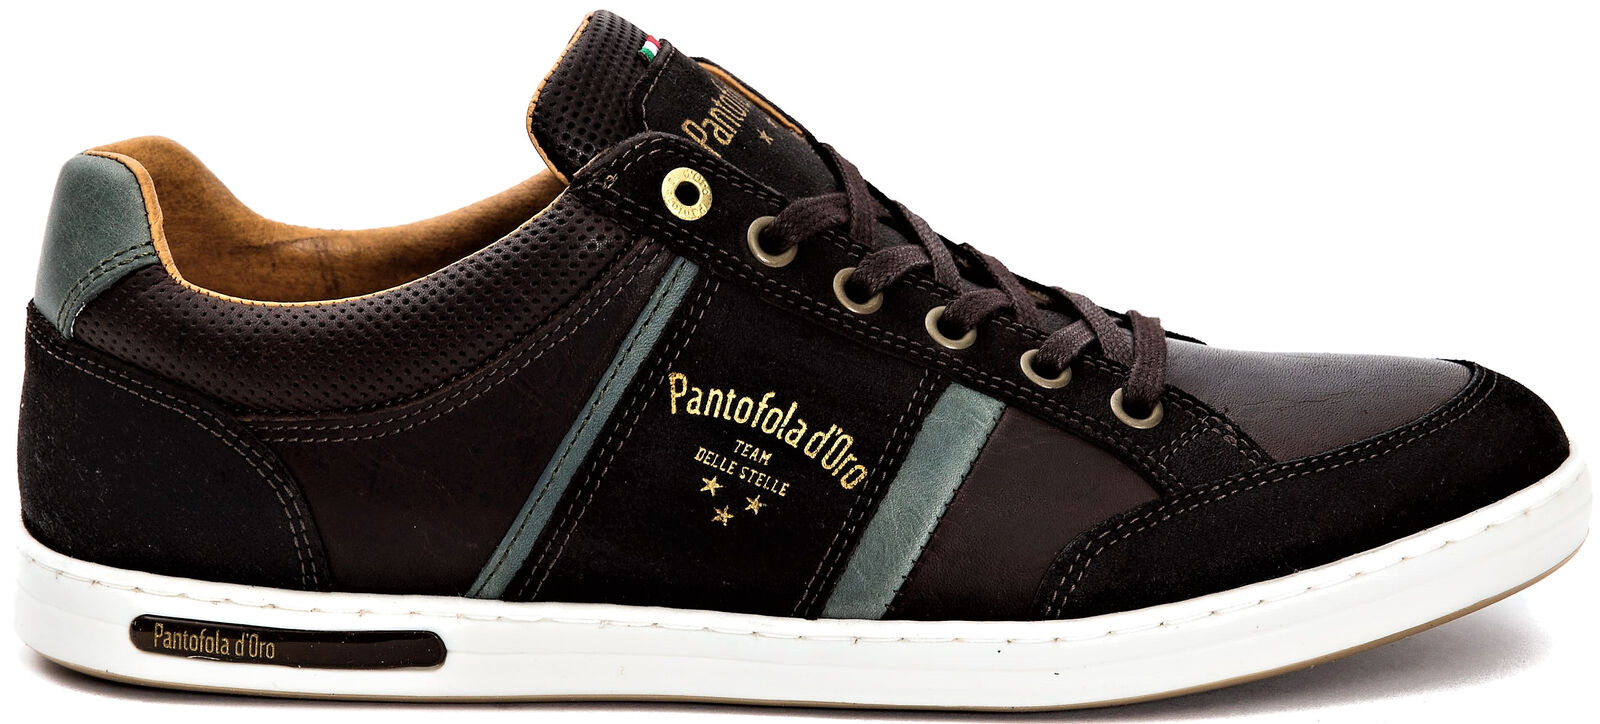 Herrenschuhe braun Pantofola d'Oro Schuhe Mann Mondovì niedrig braun